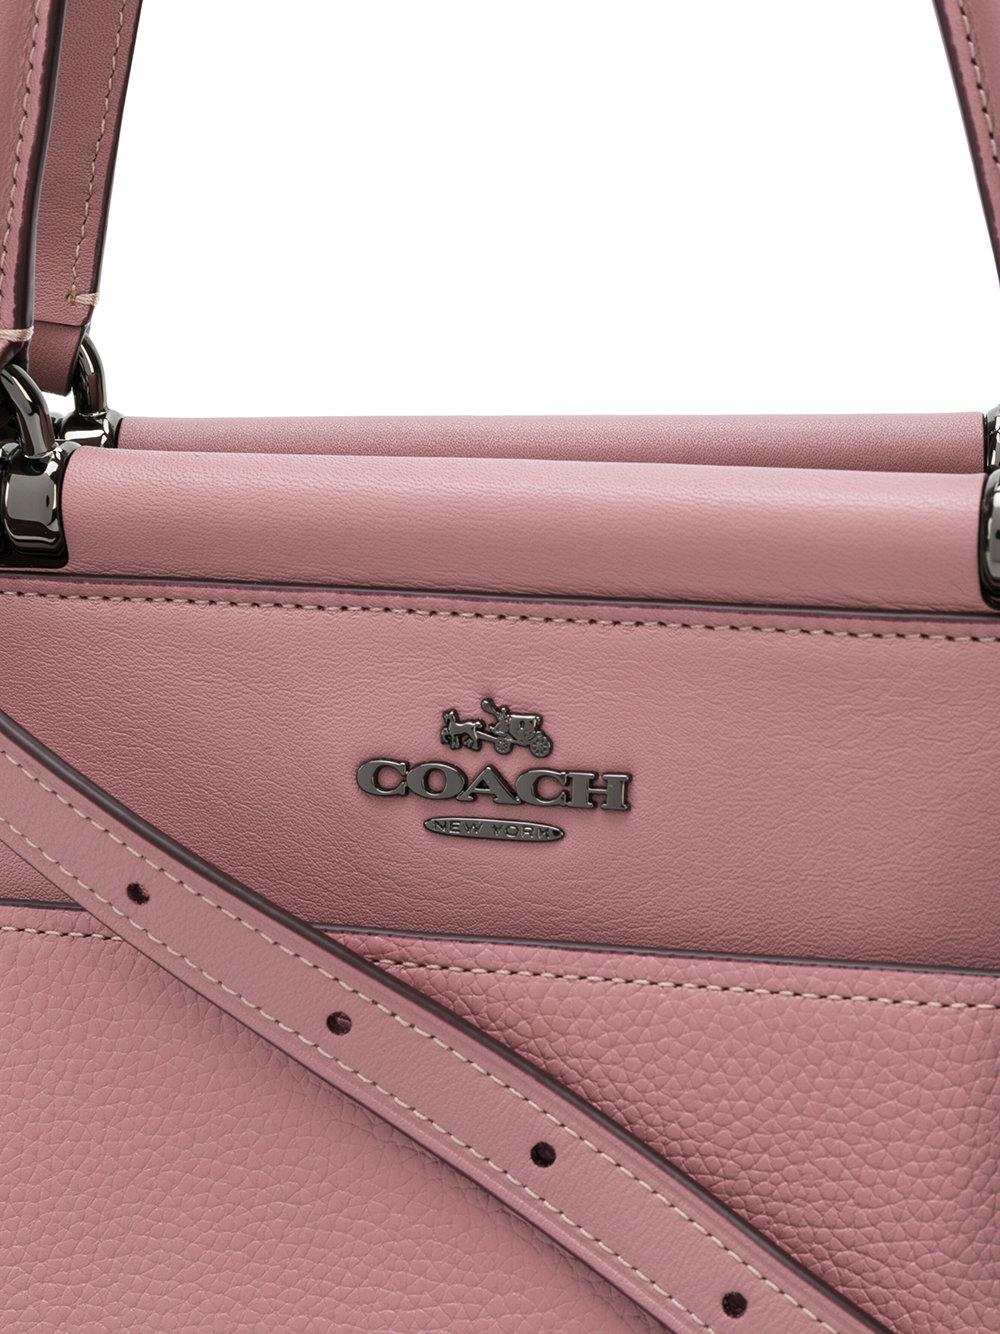 85fe506fdb Lyst - COACH Grace Shoulder Bag in Pink